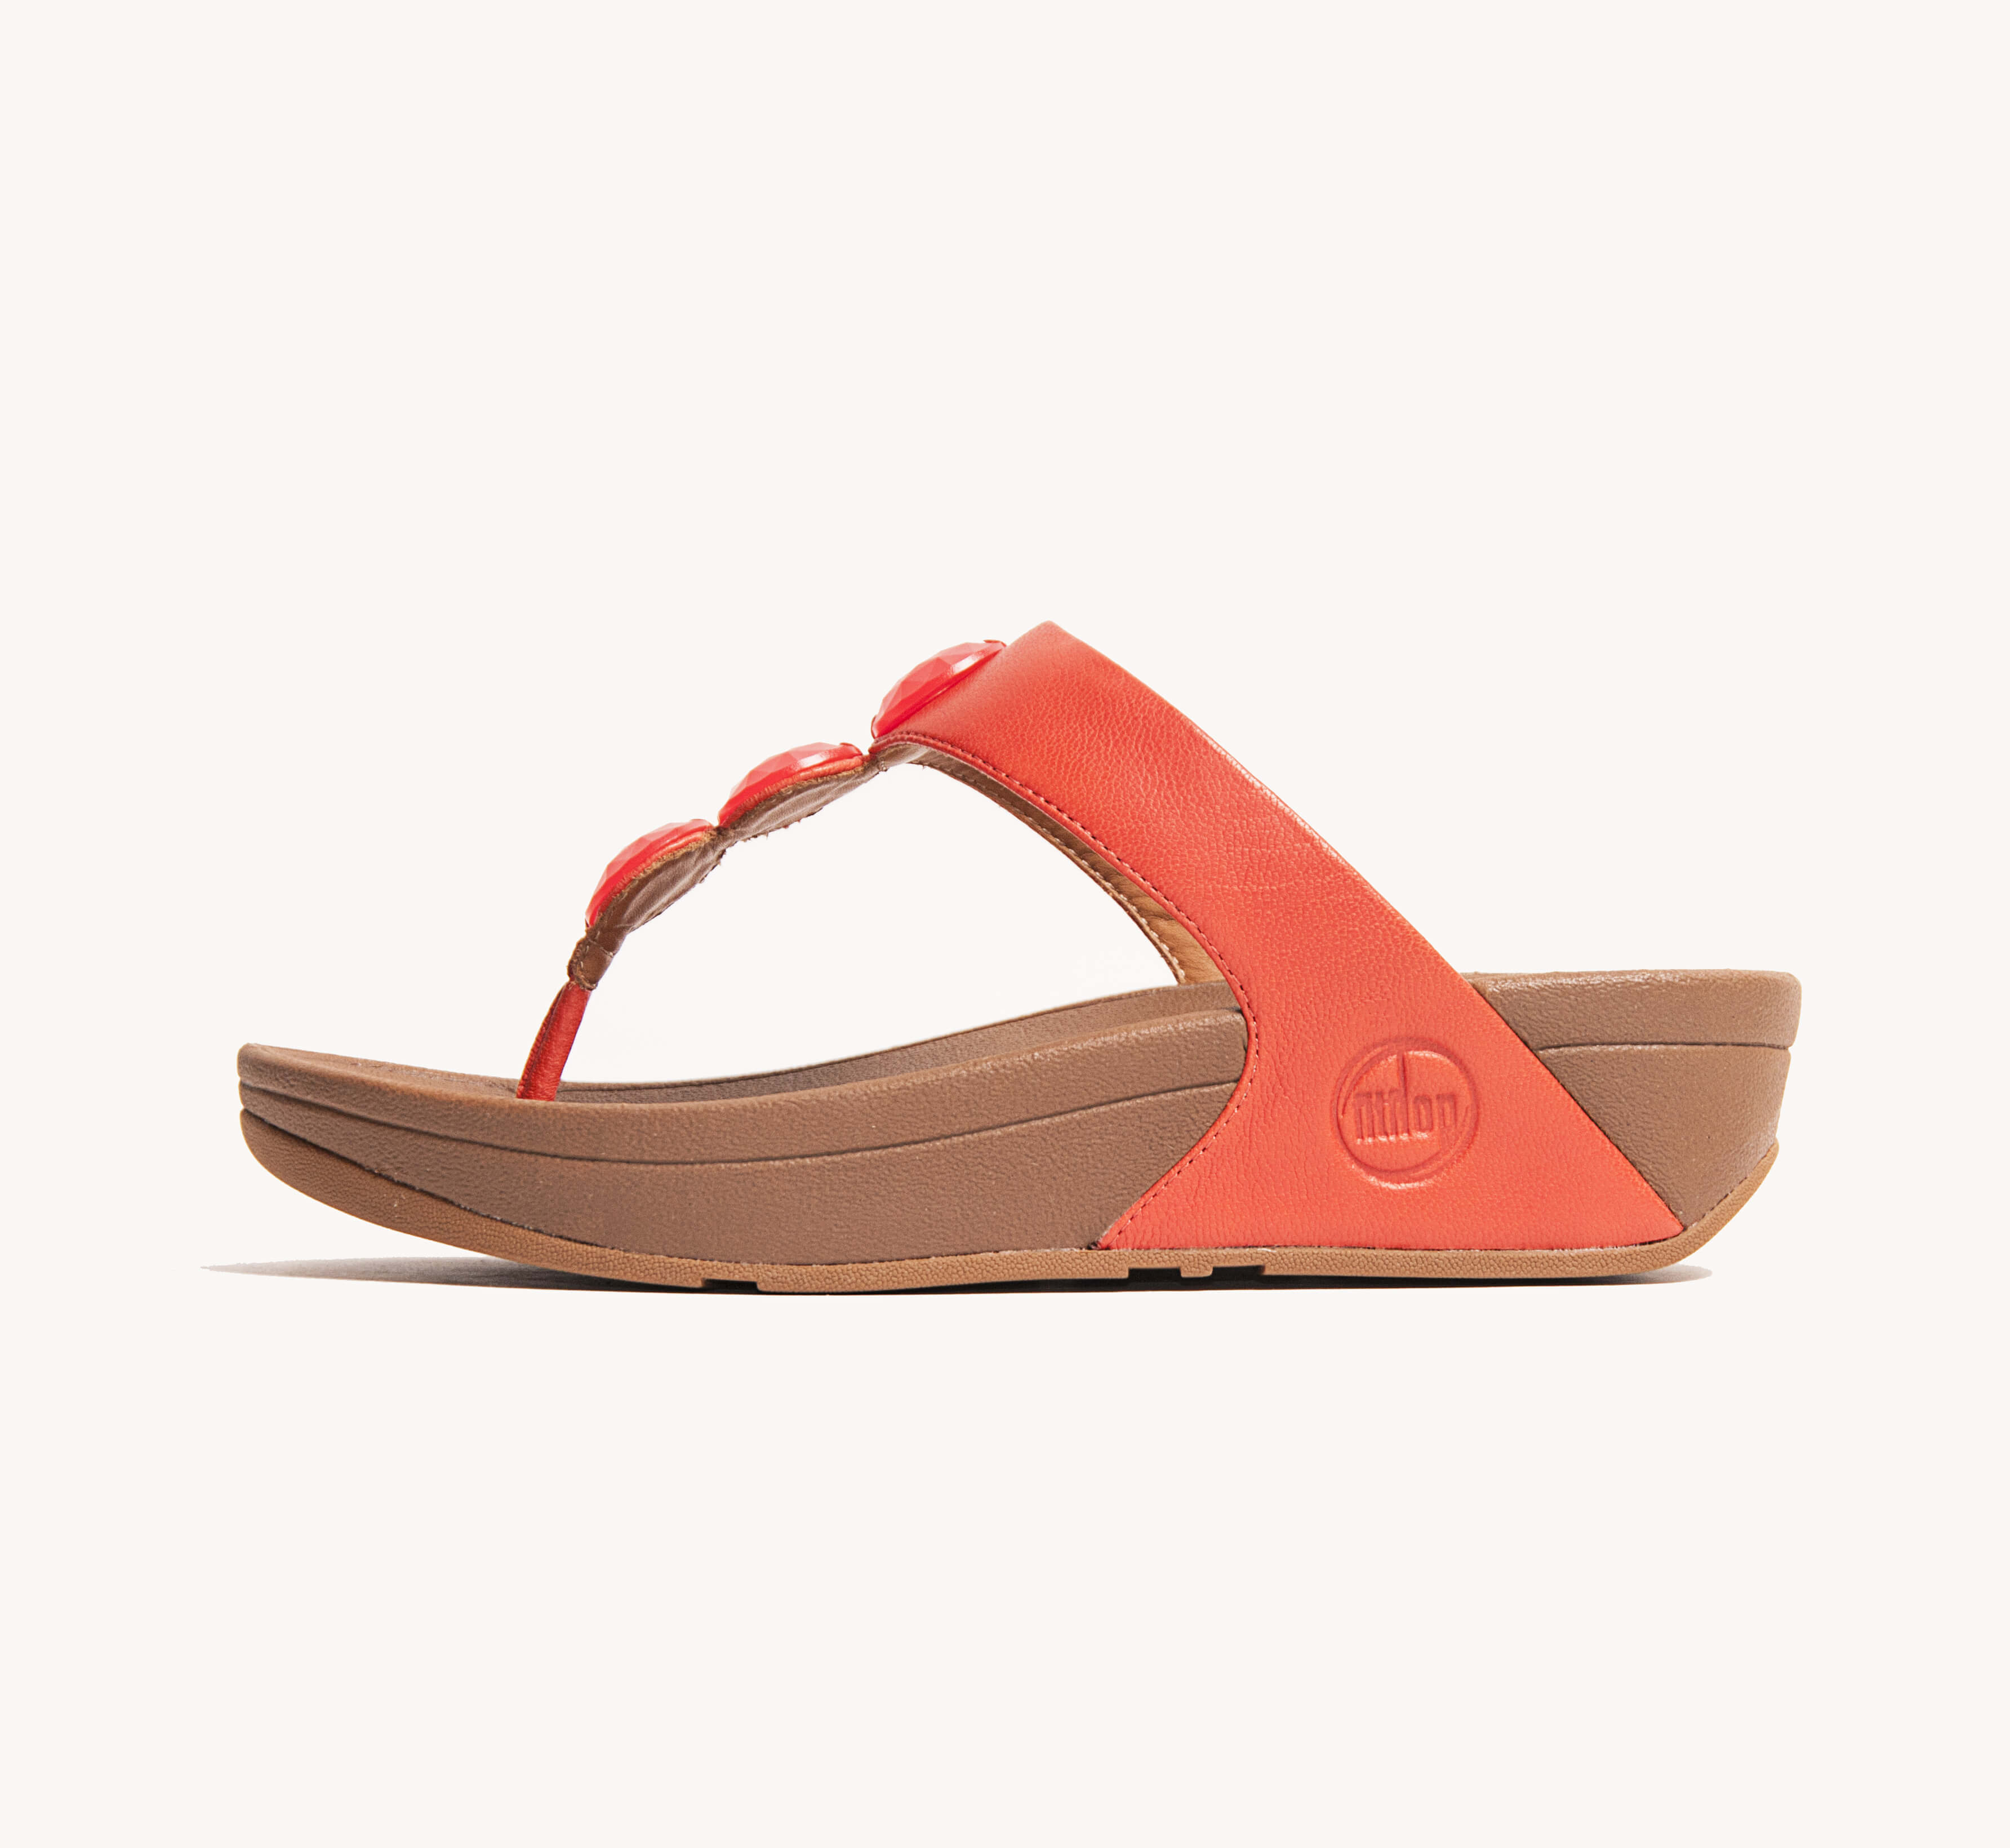 d68b42900e3 Shop the Summer Sandals Sale at Charles Clinkard